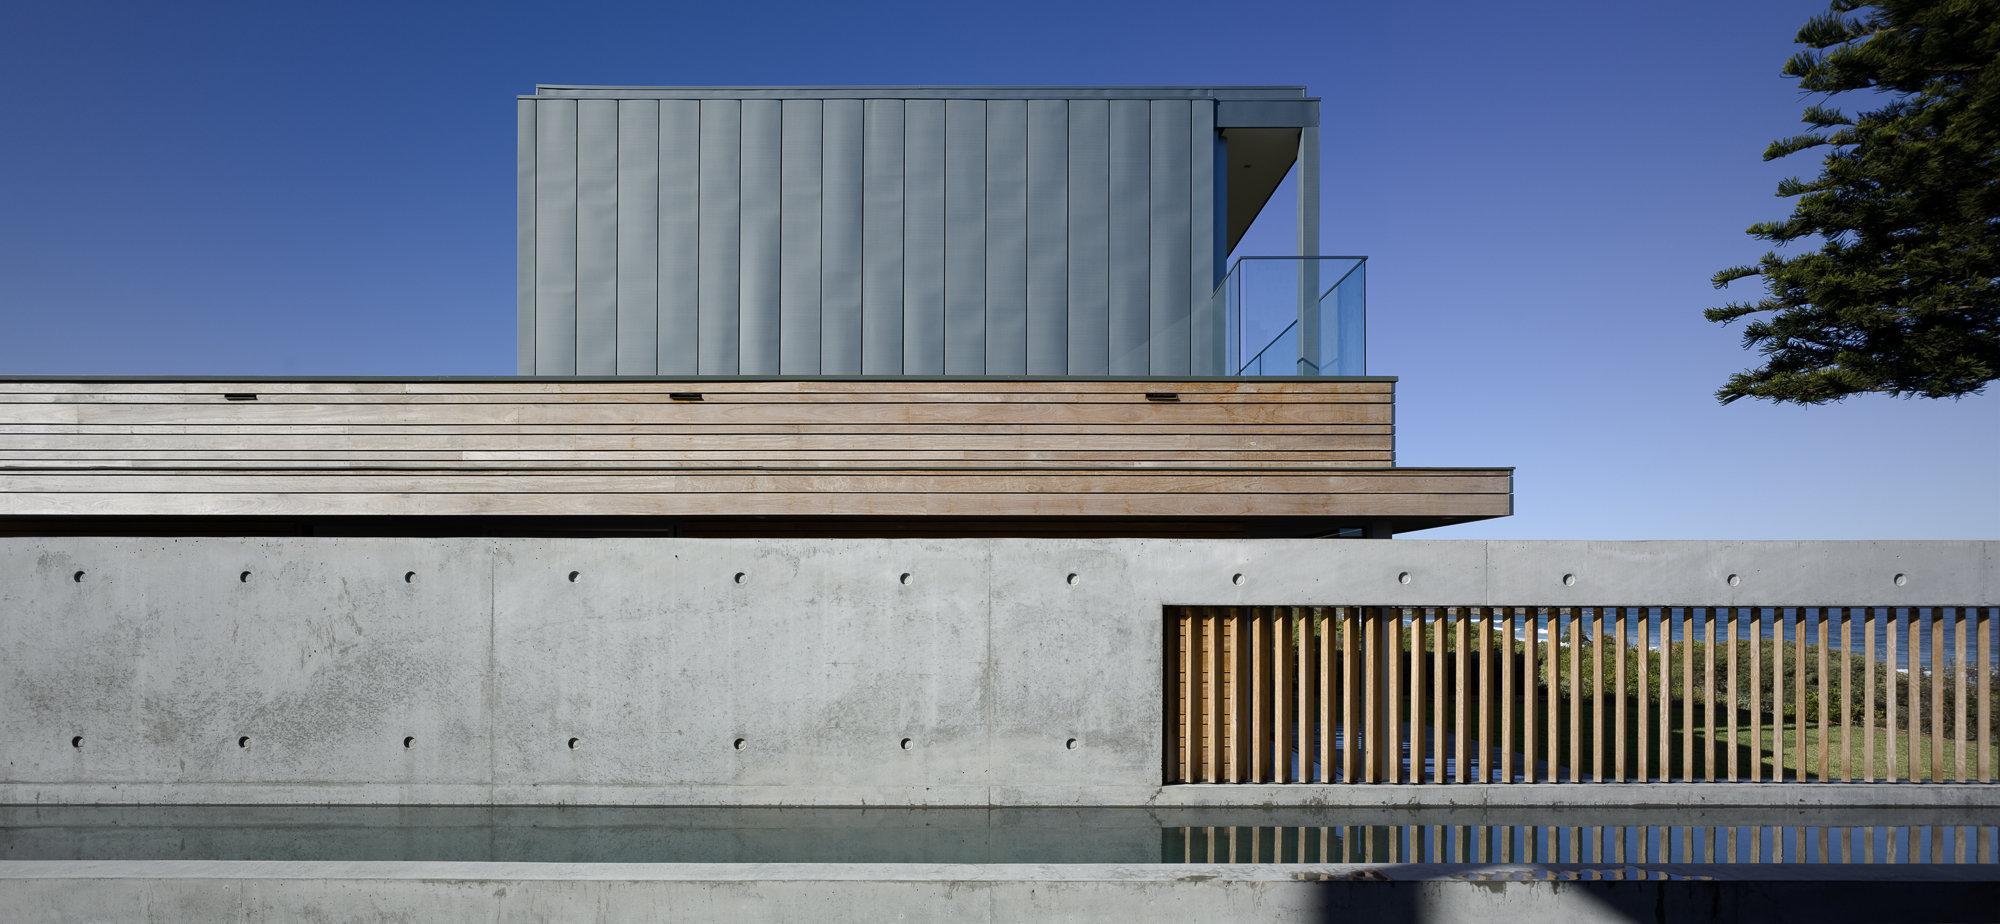 Boomerang Beach House, New South Wales